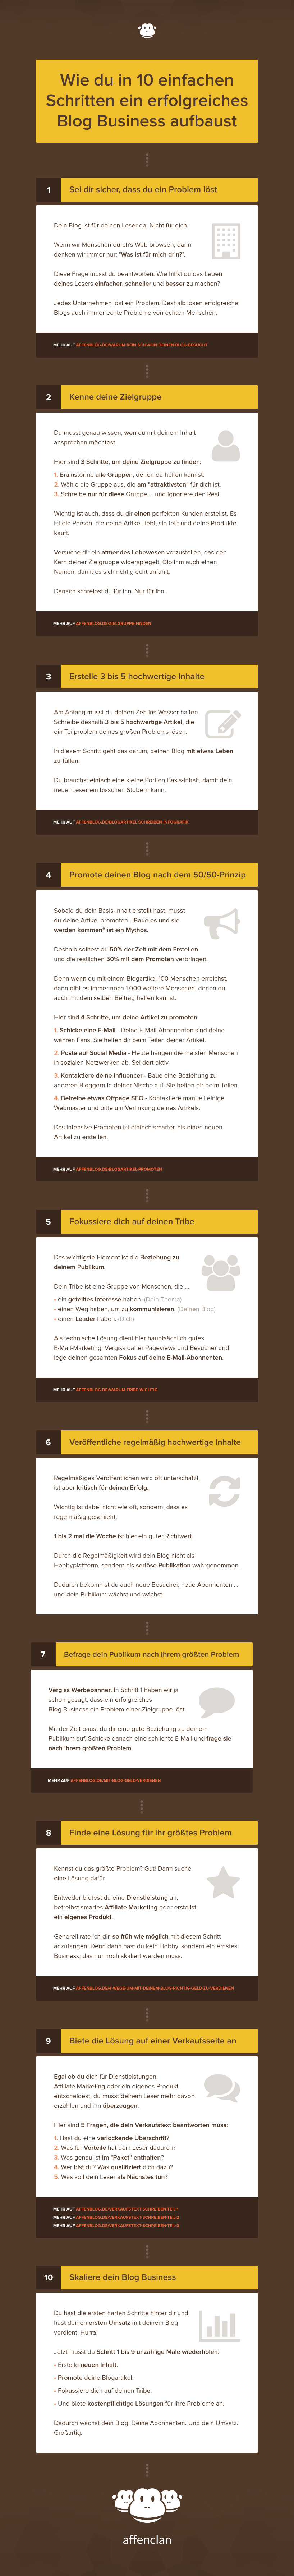 blog-business-aufbauen-infografik